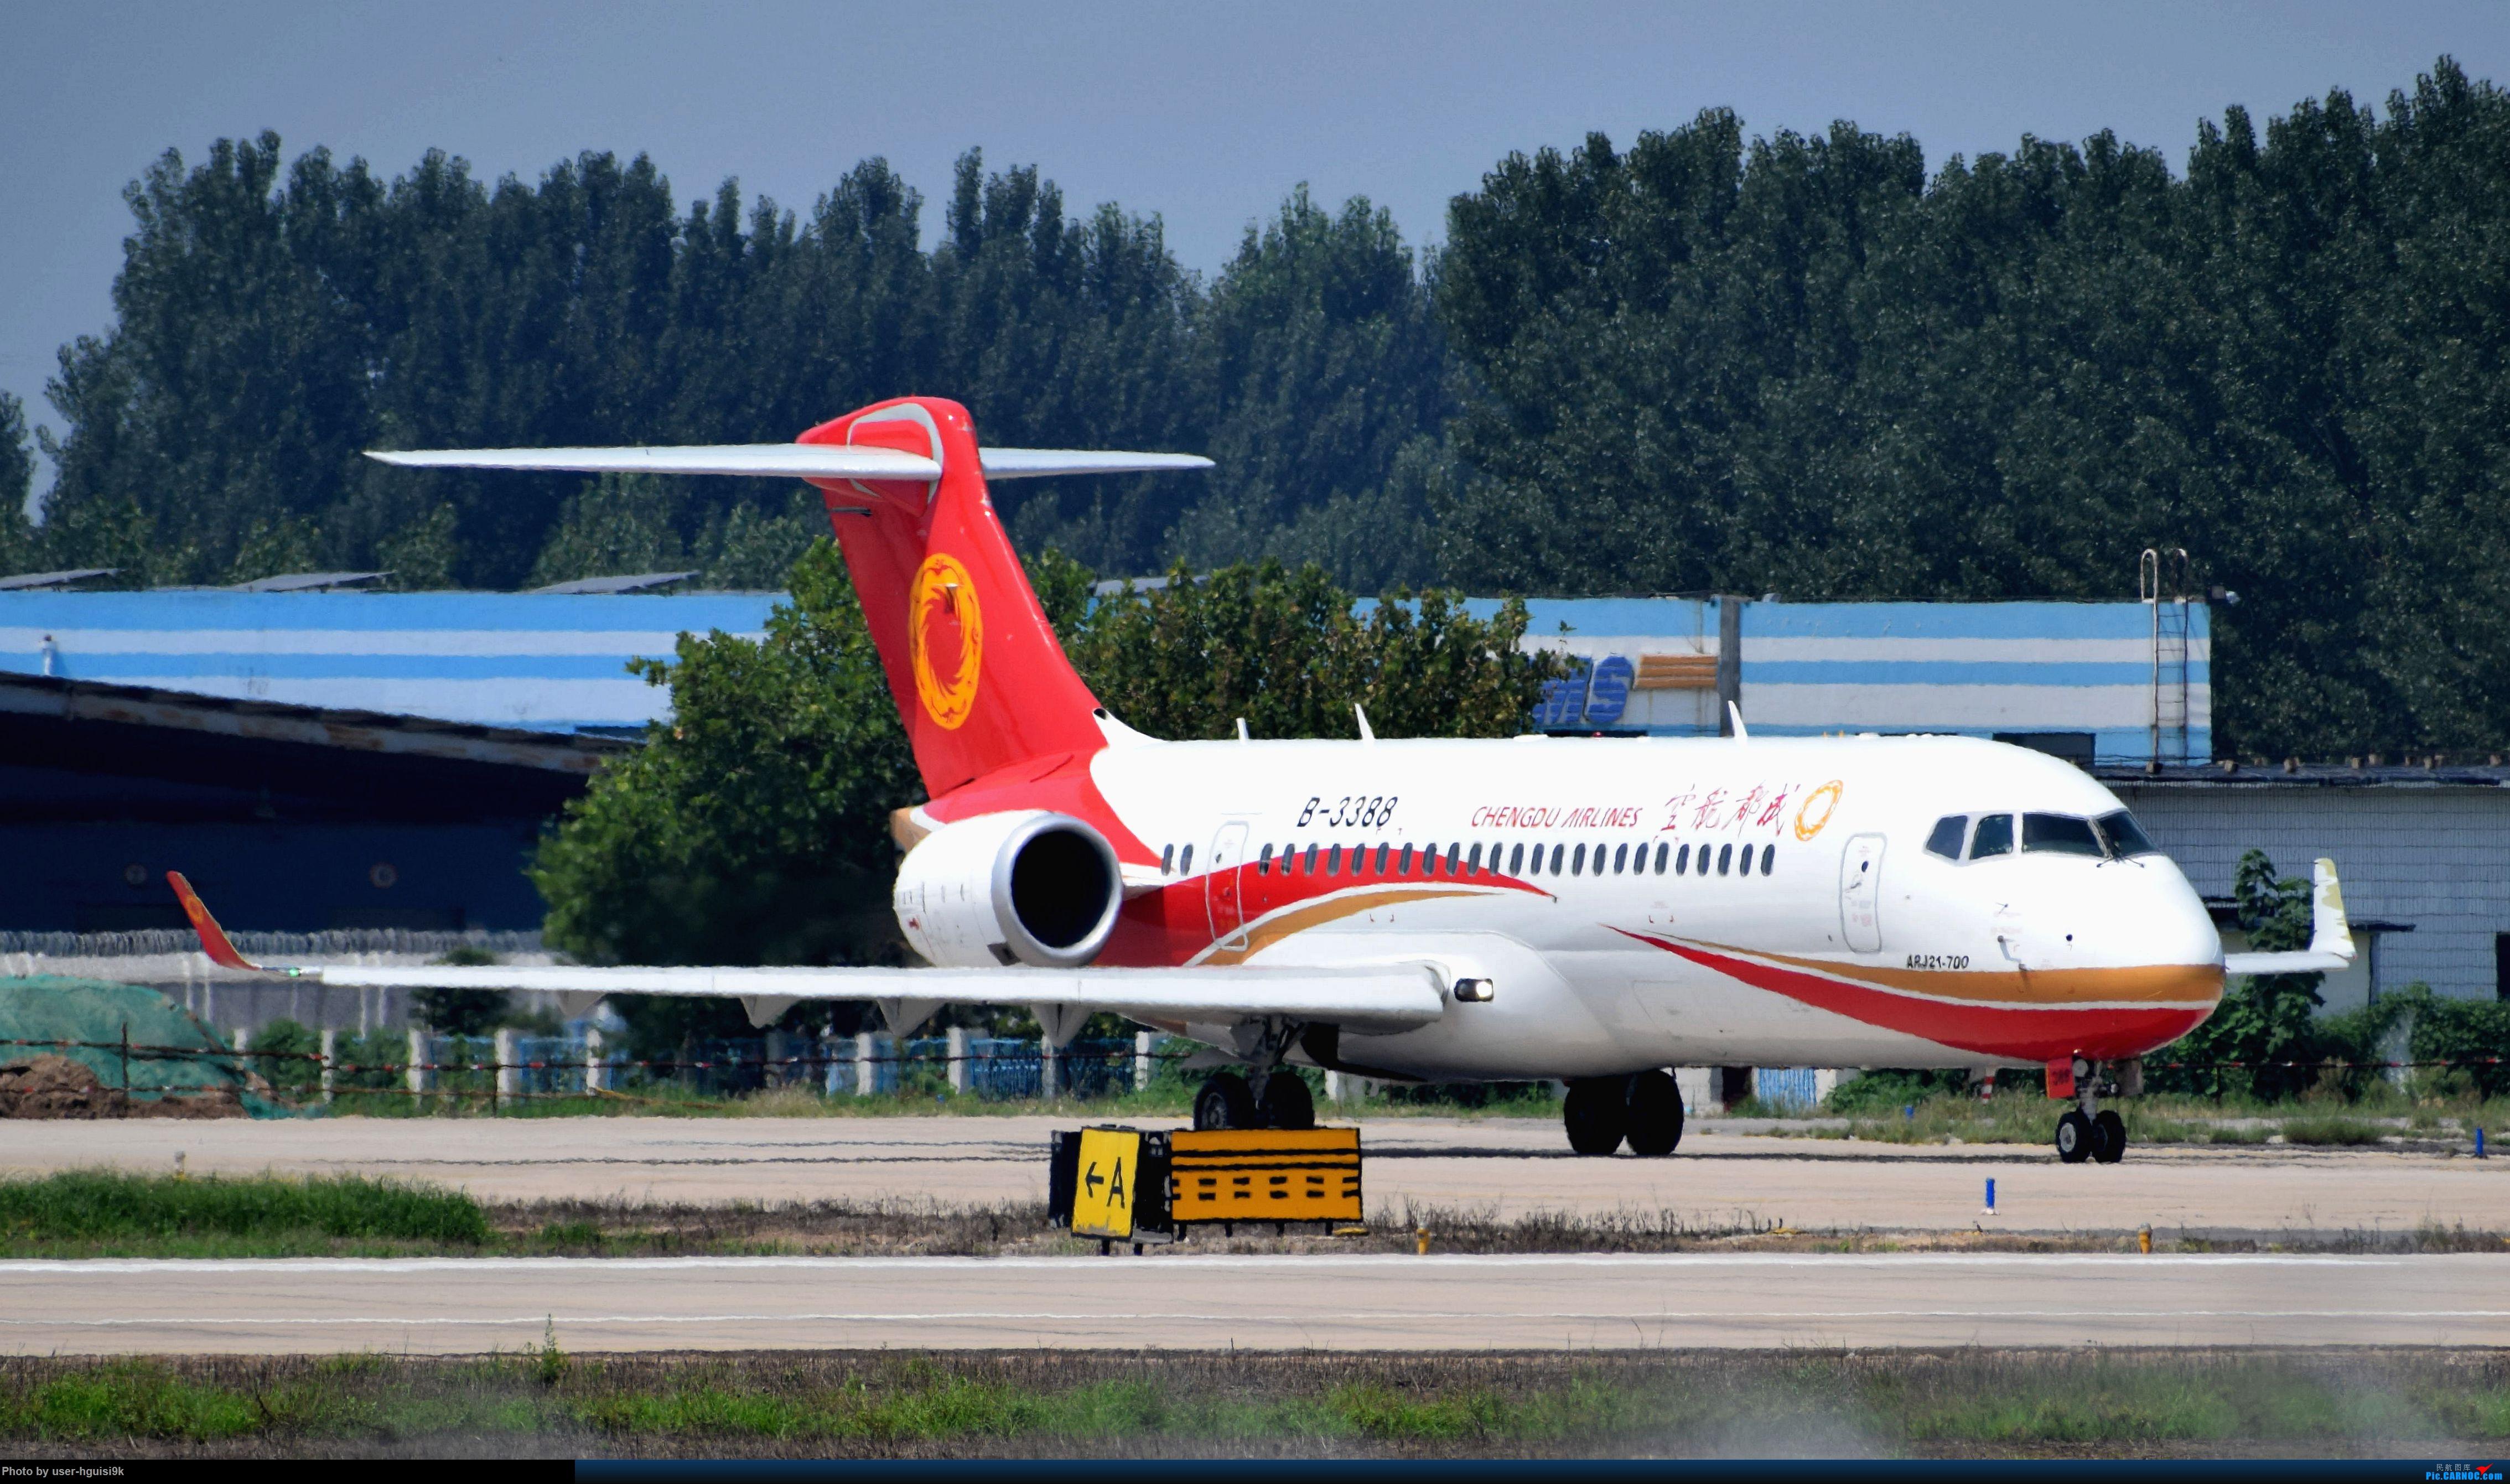 Re:[原创]济南遥墙机场拍机杂图。 ARJ-21 B-3388 中国济南遥墙国际机场